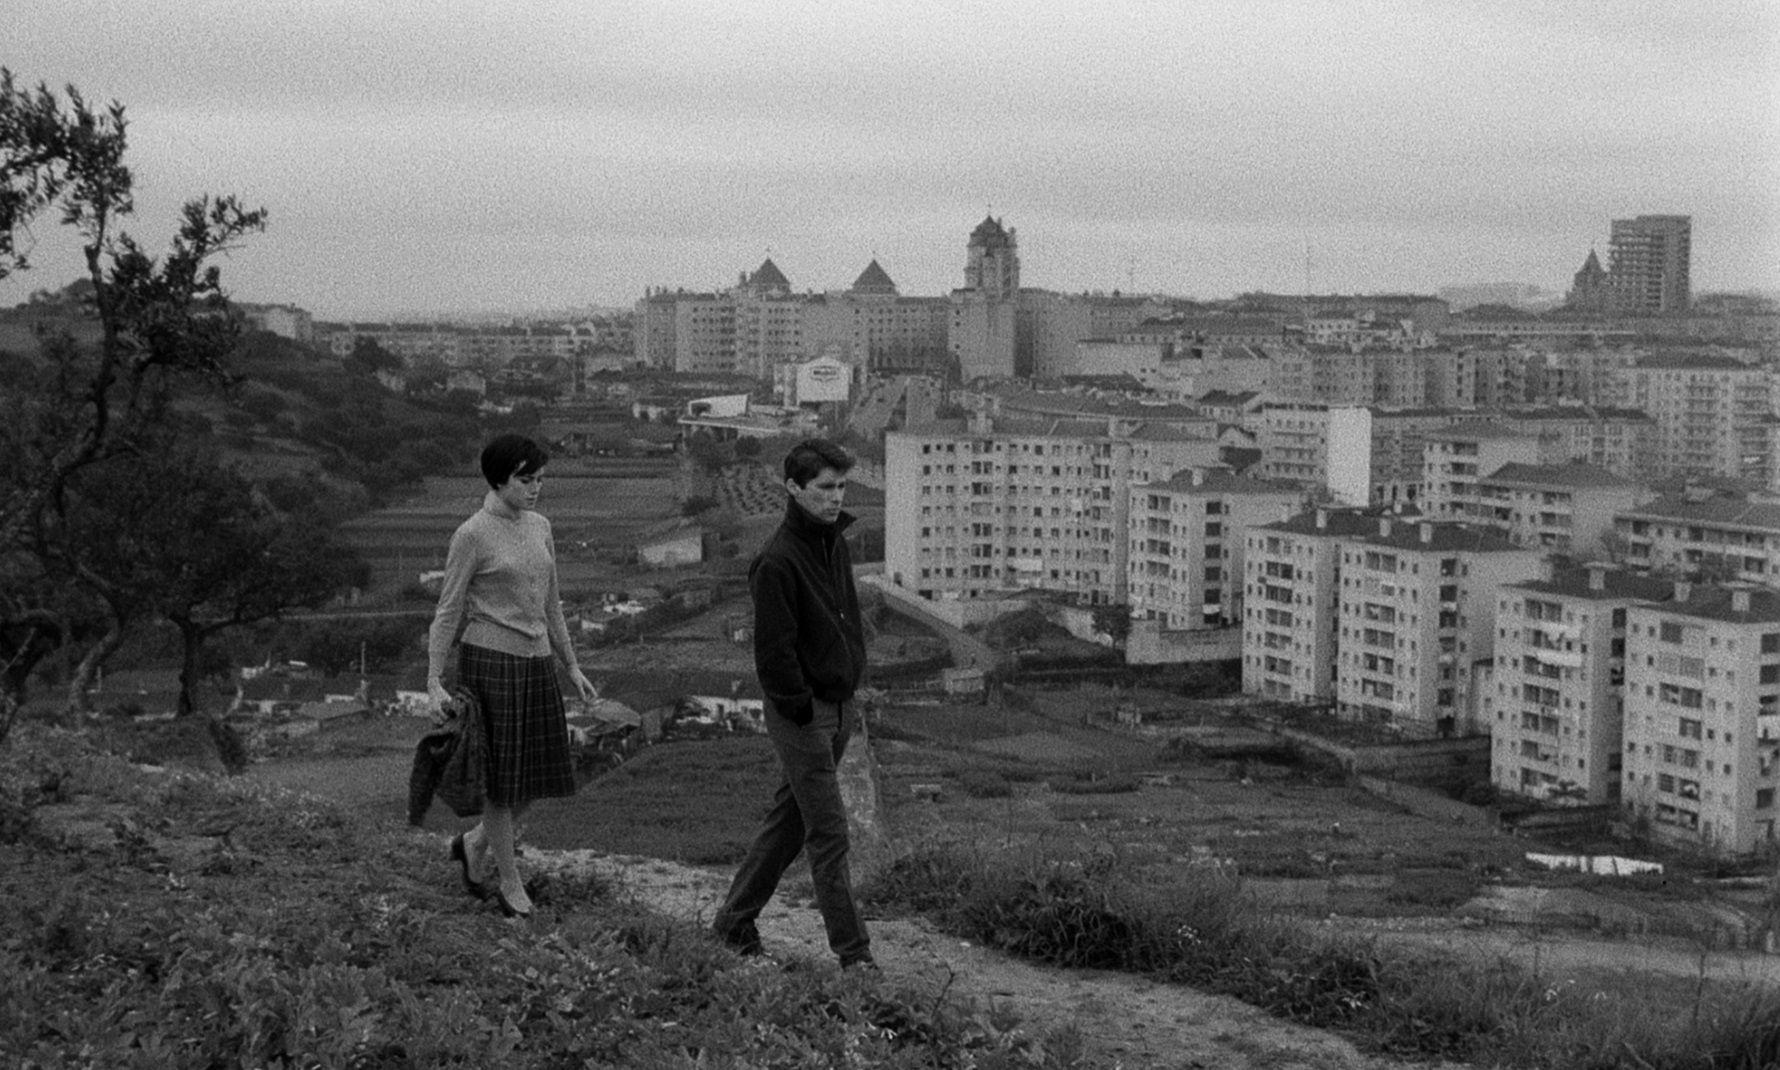 Cinema de Paulo Rocha em retrospectiva na Cinemateca Francesa